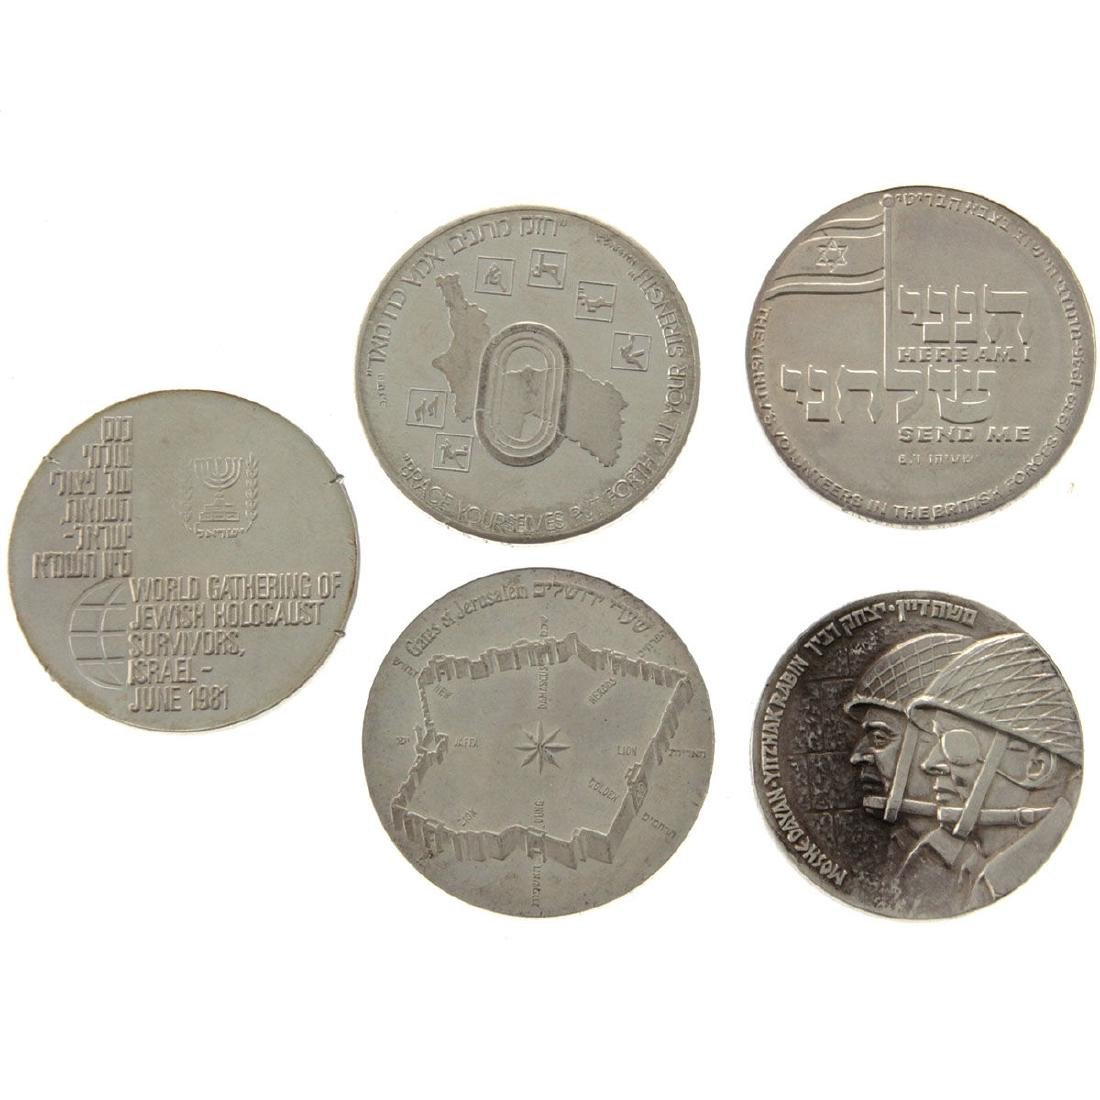 Five Israel Silver Medals.